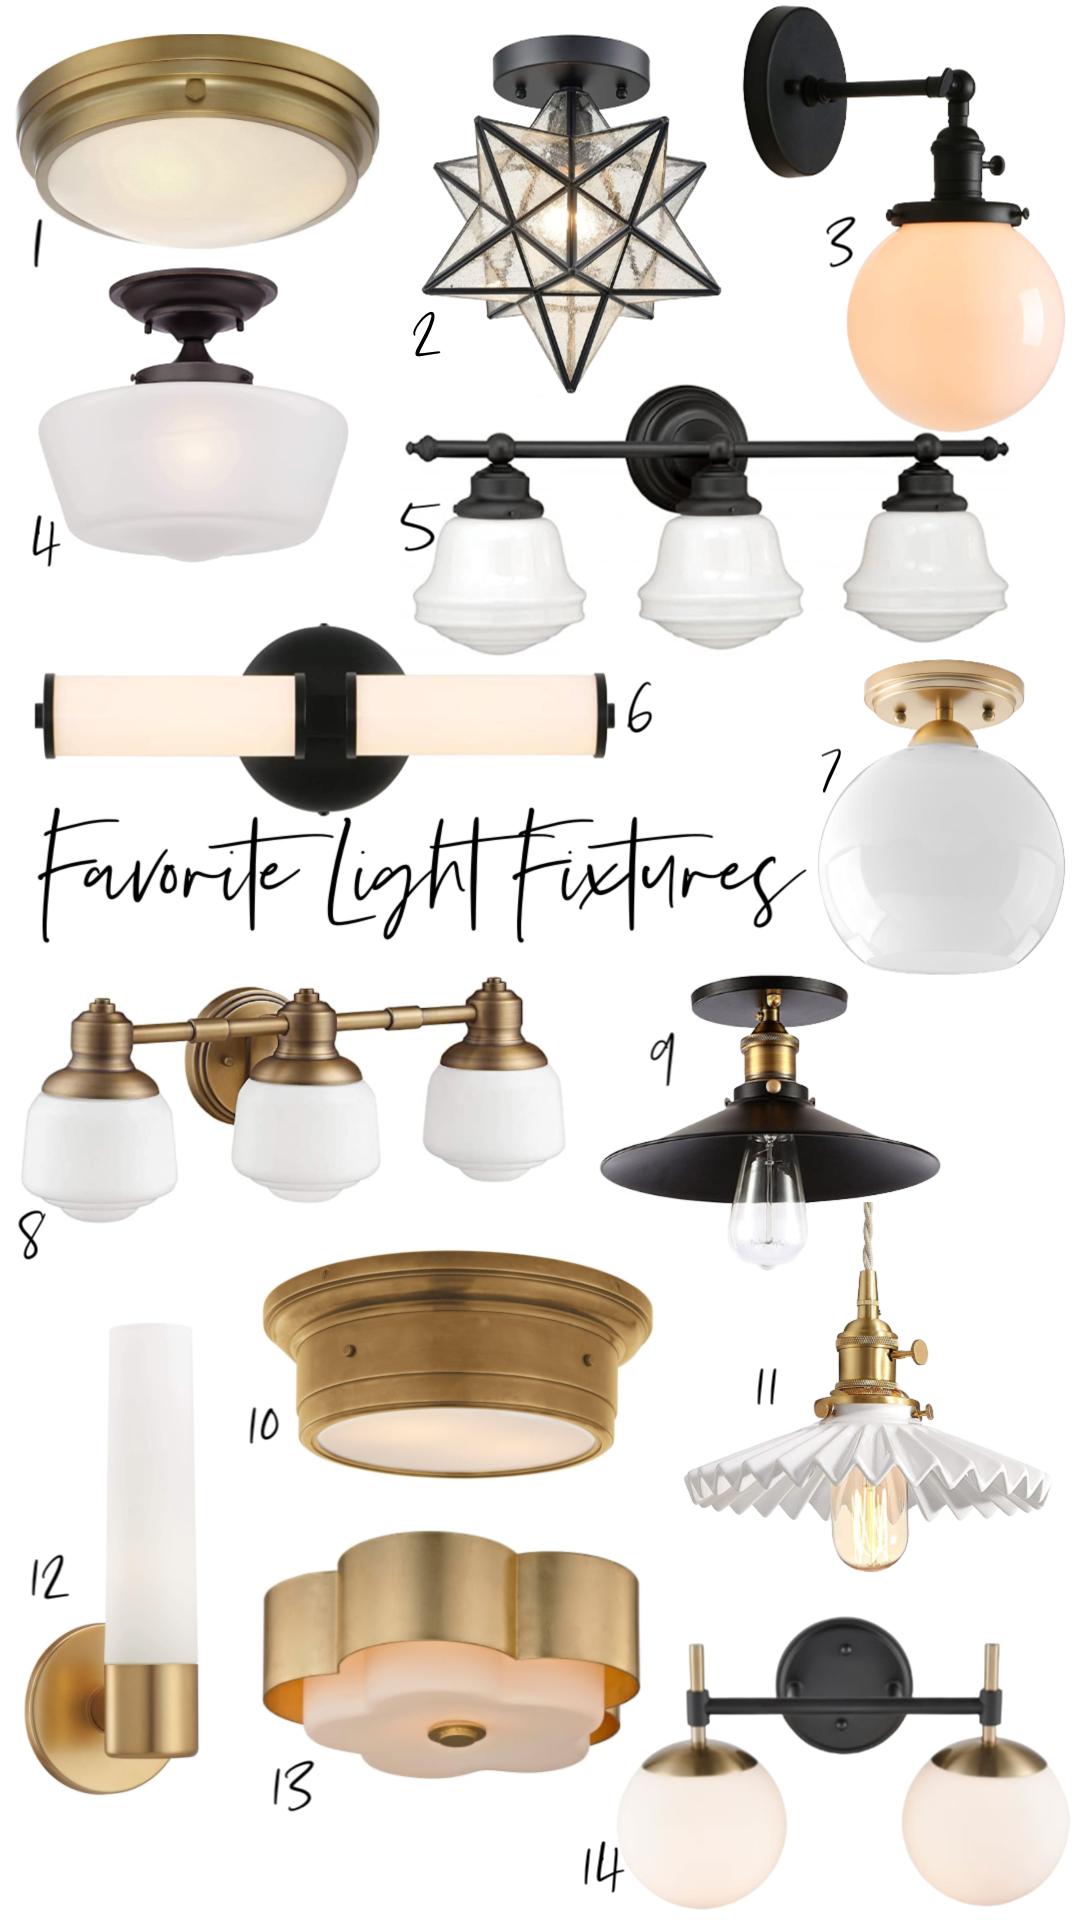 Favorite Affordable Light Fixtures